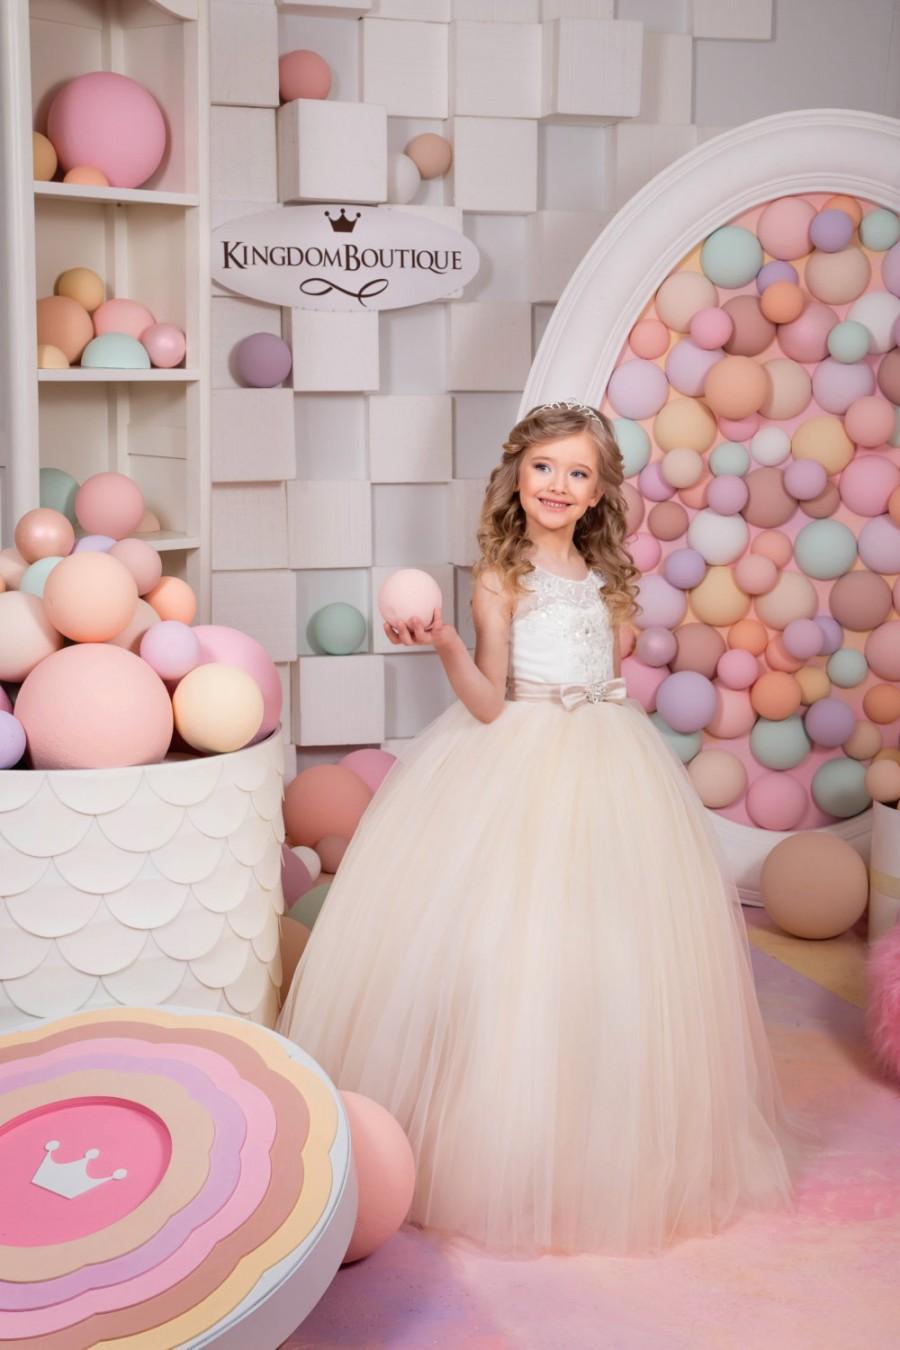 Свадьба - Ivory and Beige Flower Girl Dress - Birthday Wedding Party Holiday Bridesmaid Flower Girl Ivory and Beige Tulle Lace Dress